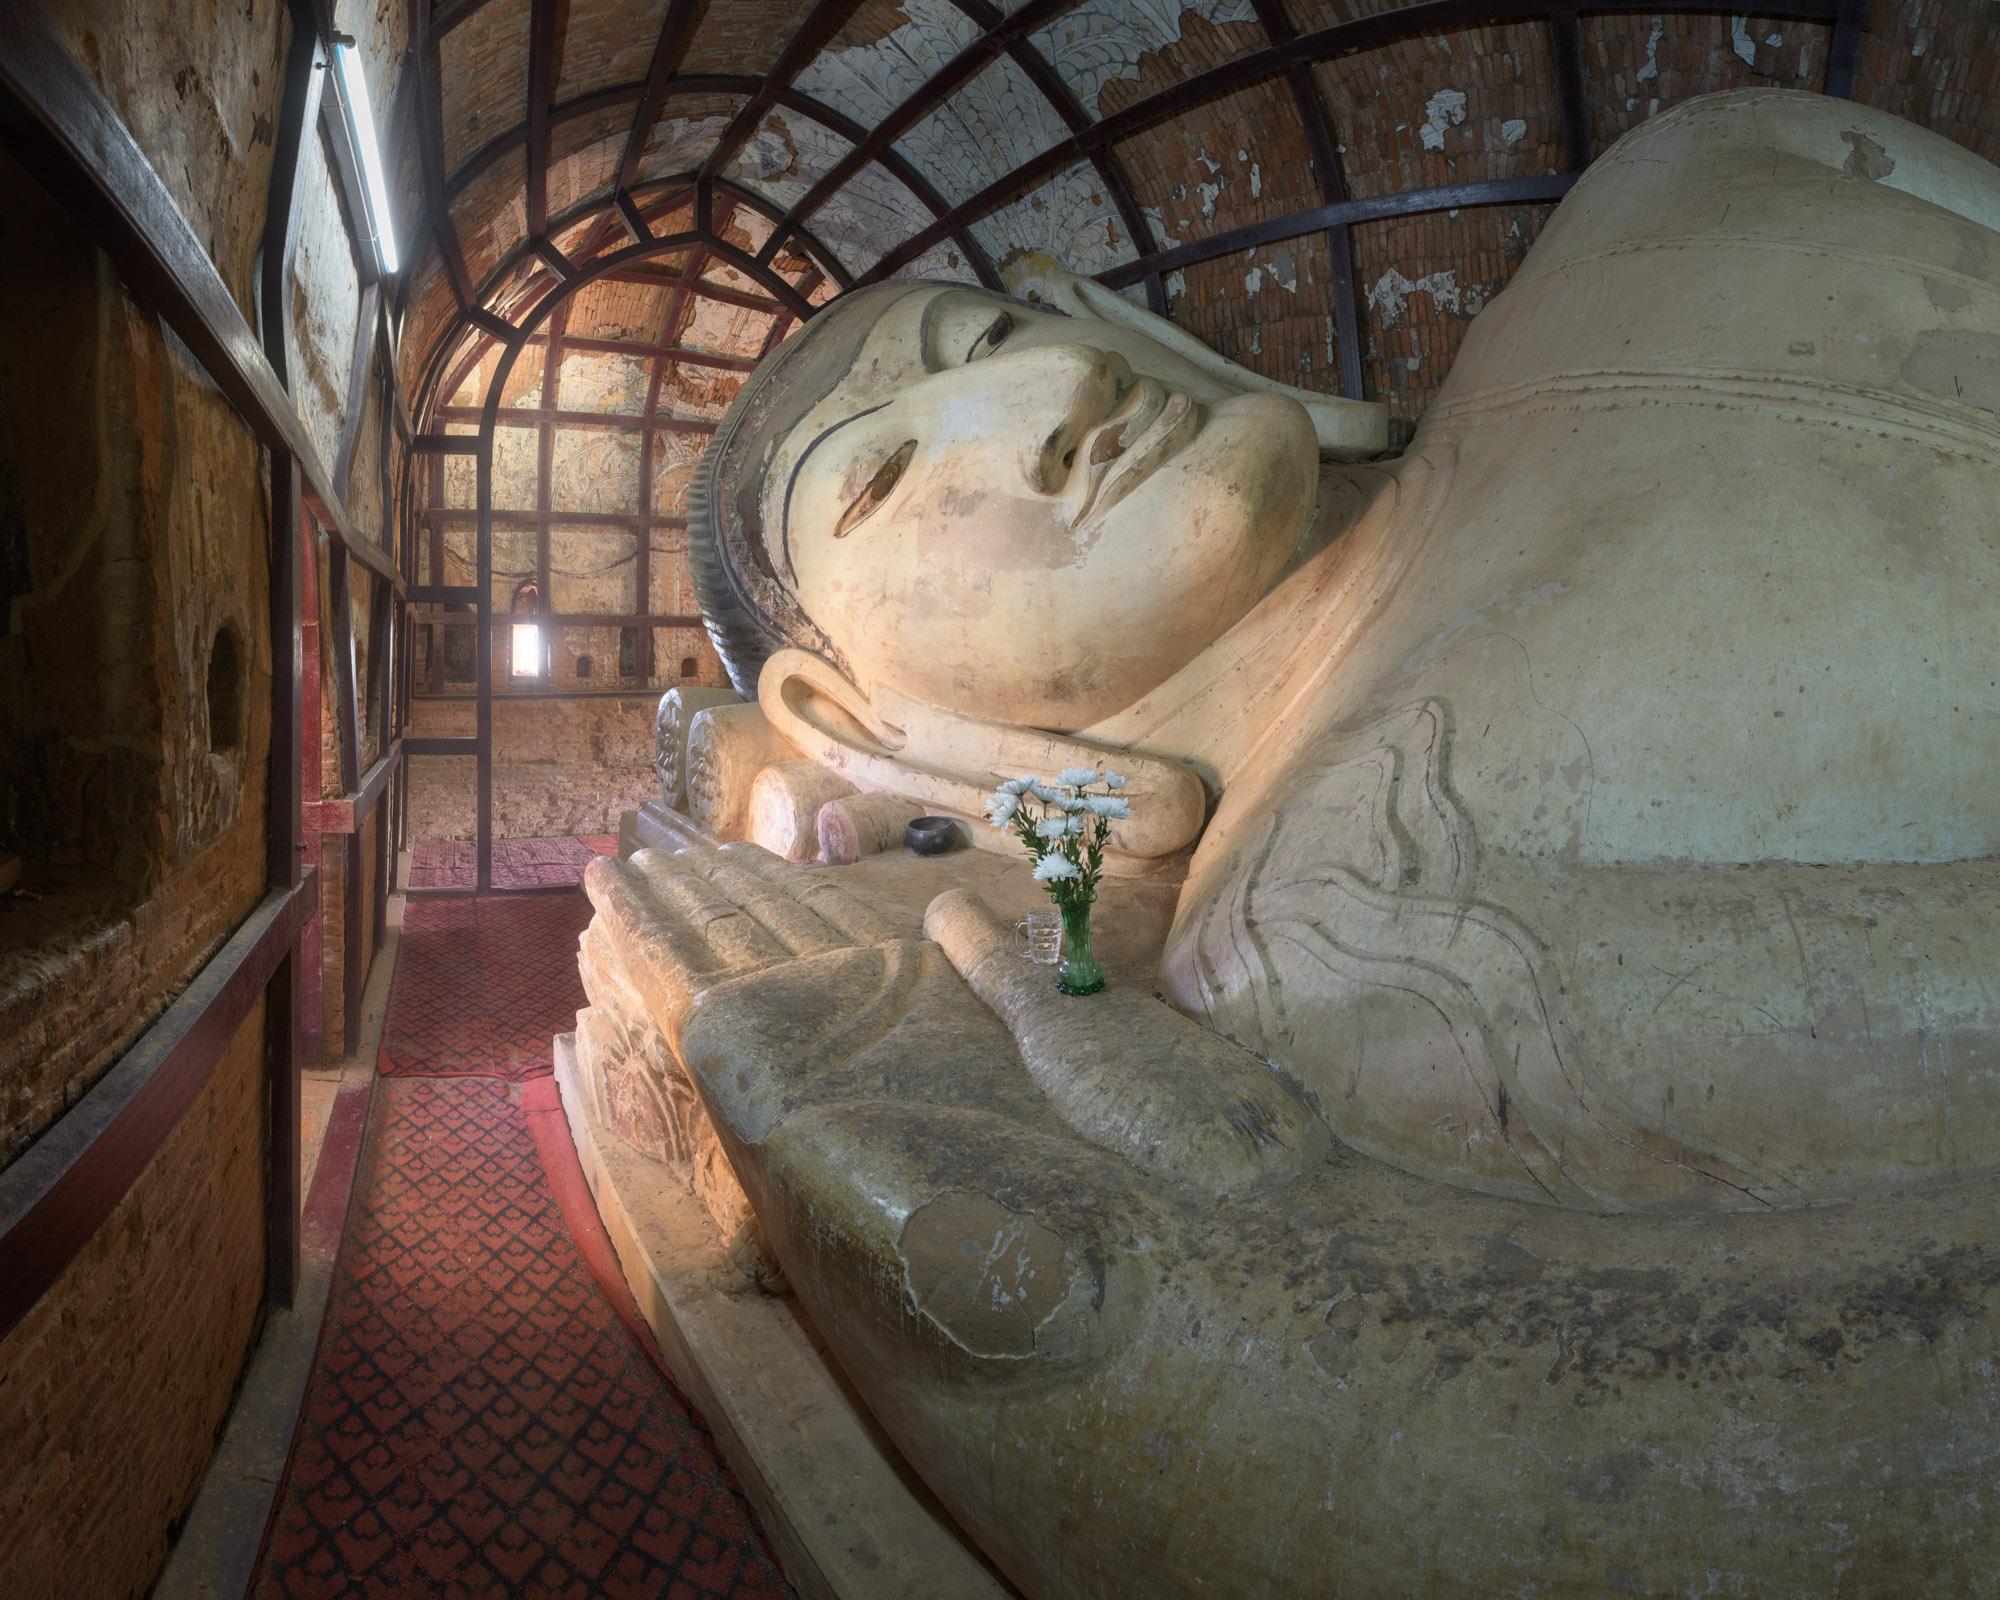 Reclining Buddha in Shinbinthalyaung Temple, Bagan, Myanmar